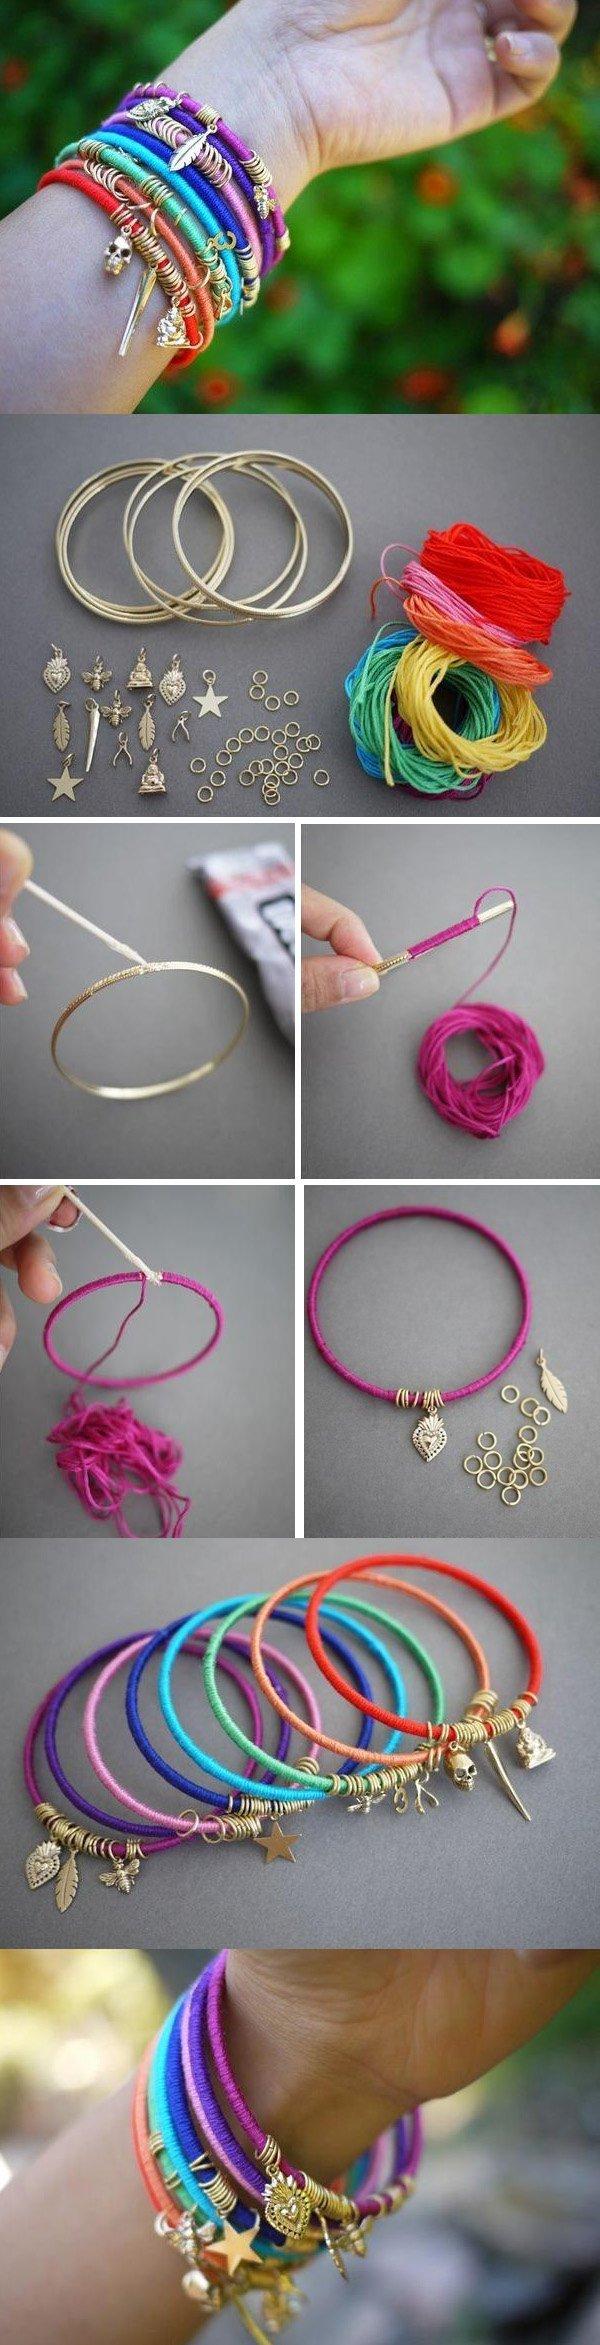 Stupendous Diy Bracelets Ideas To Make